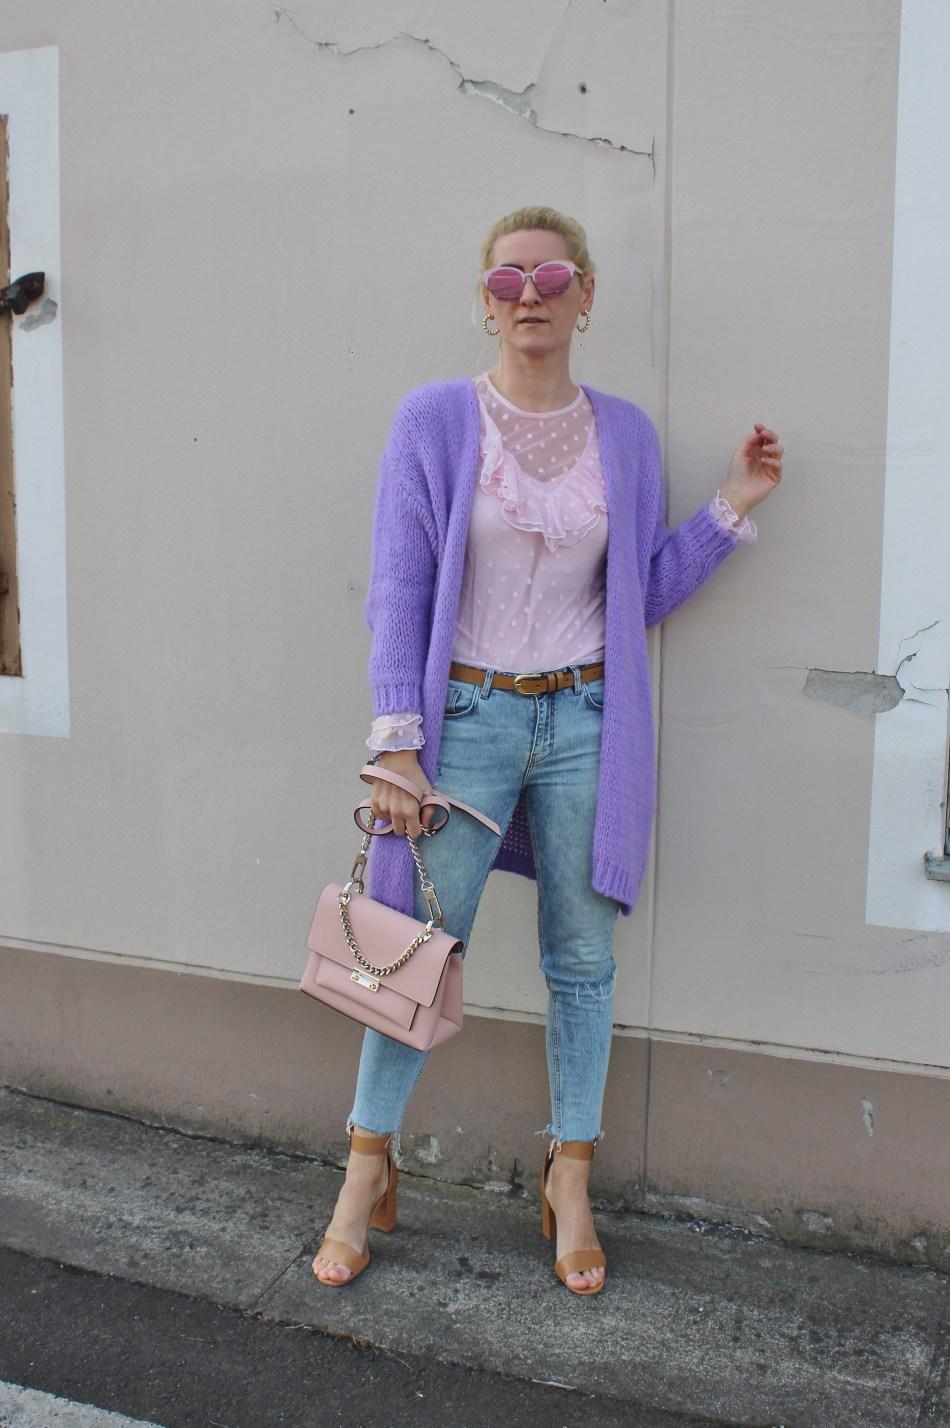 Lavendel-Trend-Denim-Volantshirt-Sandalen-Sandals-Beige-Pink-Bag-carrieslifestlye-Tamara-Prutsch-CCC Shoes and Bags